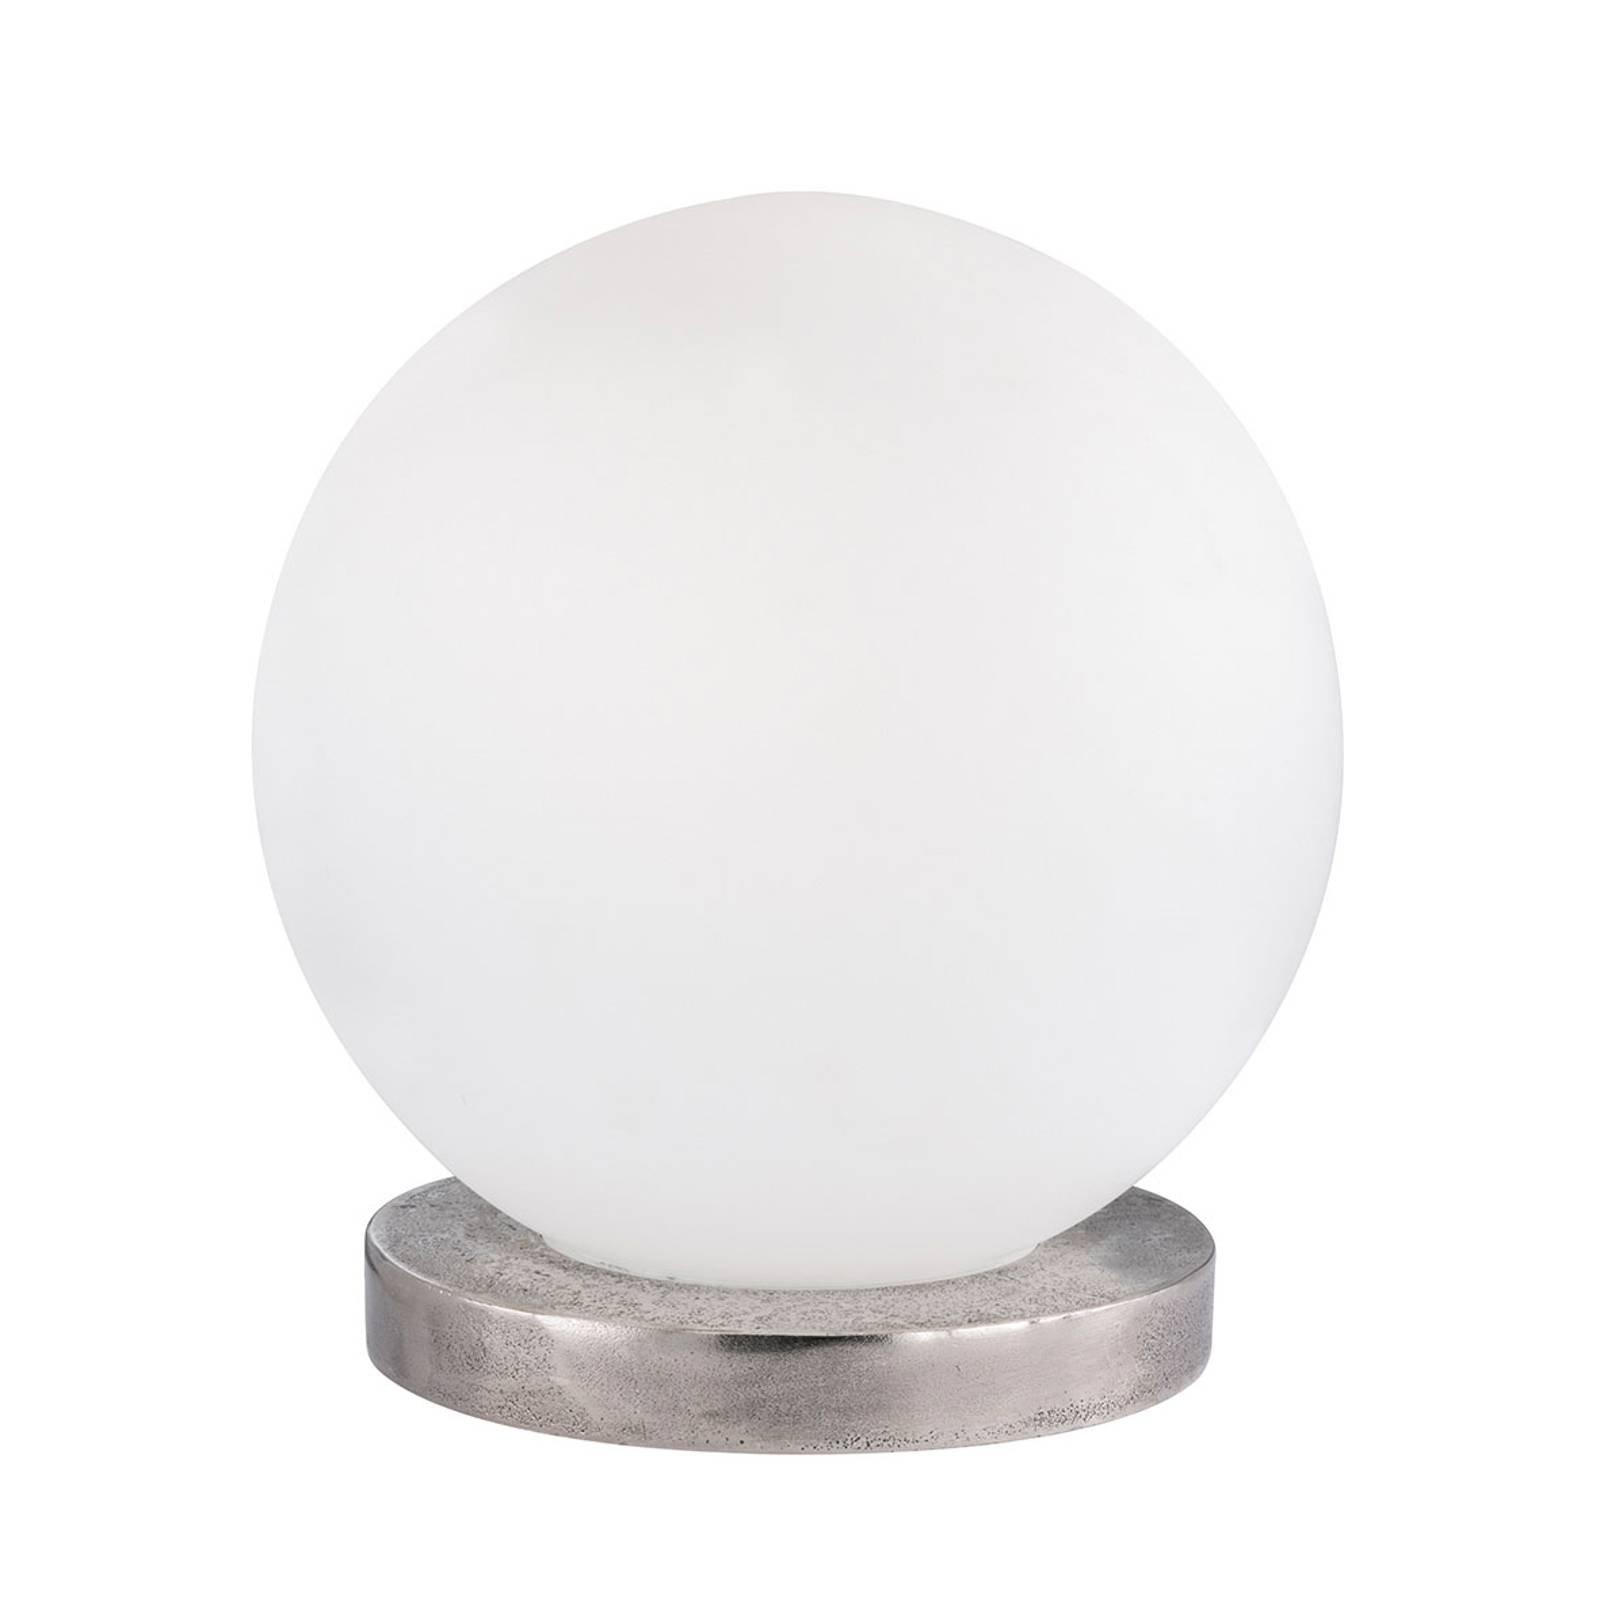 Bordlampe Antony, opal kule, fot nikkel, Ø20cm